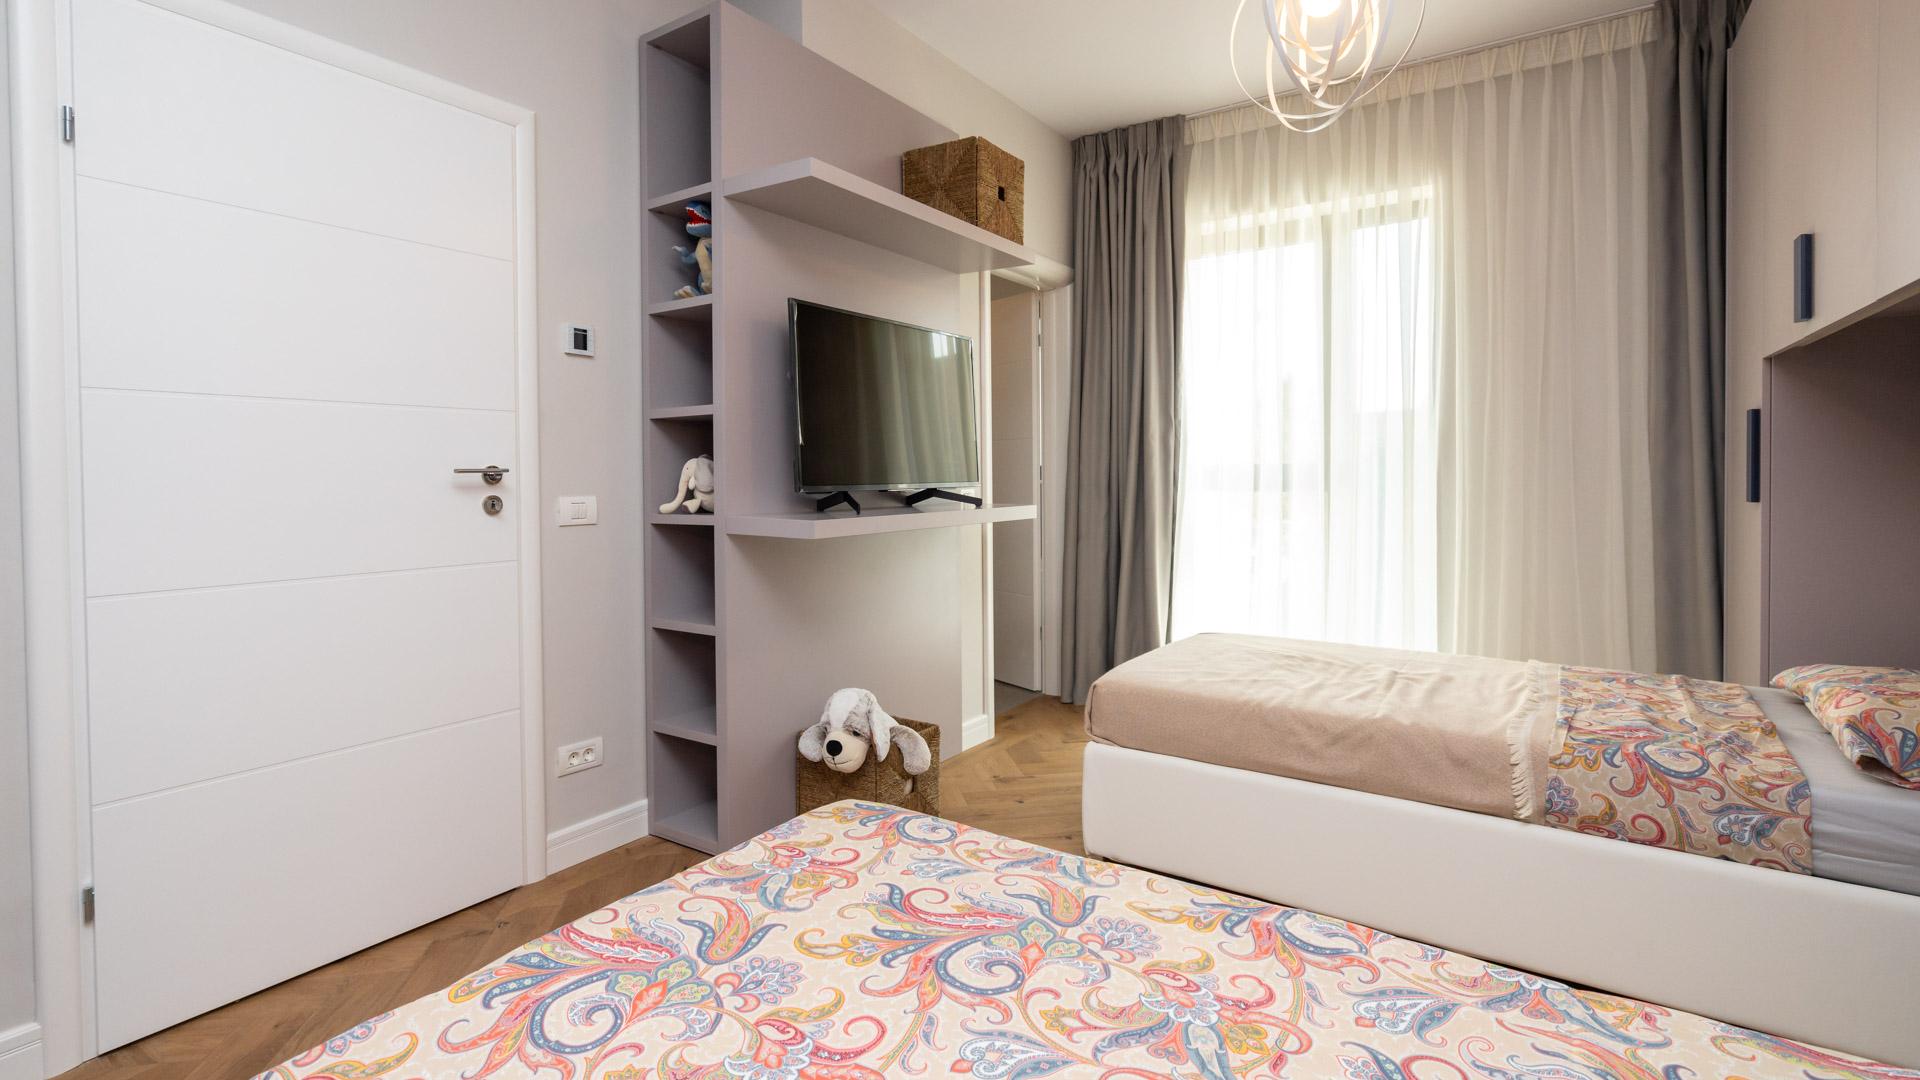 Northville-Baneasa-vila-showroom-dormitor-2